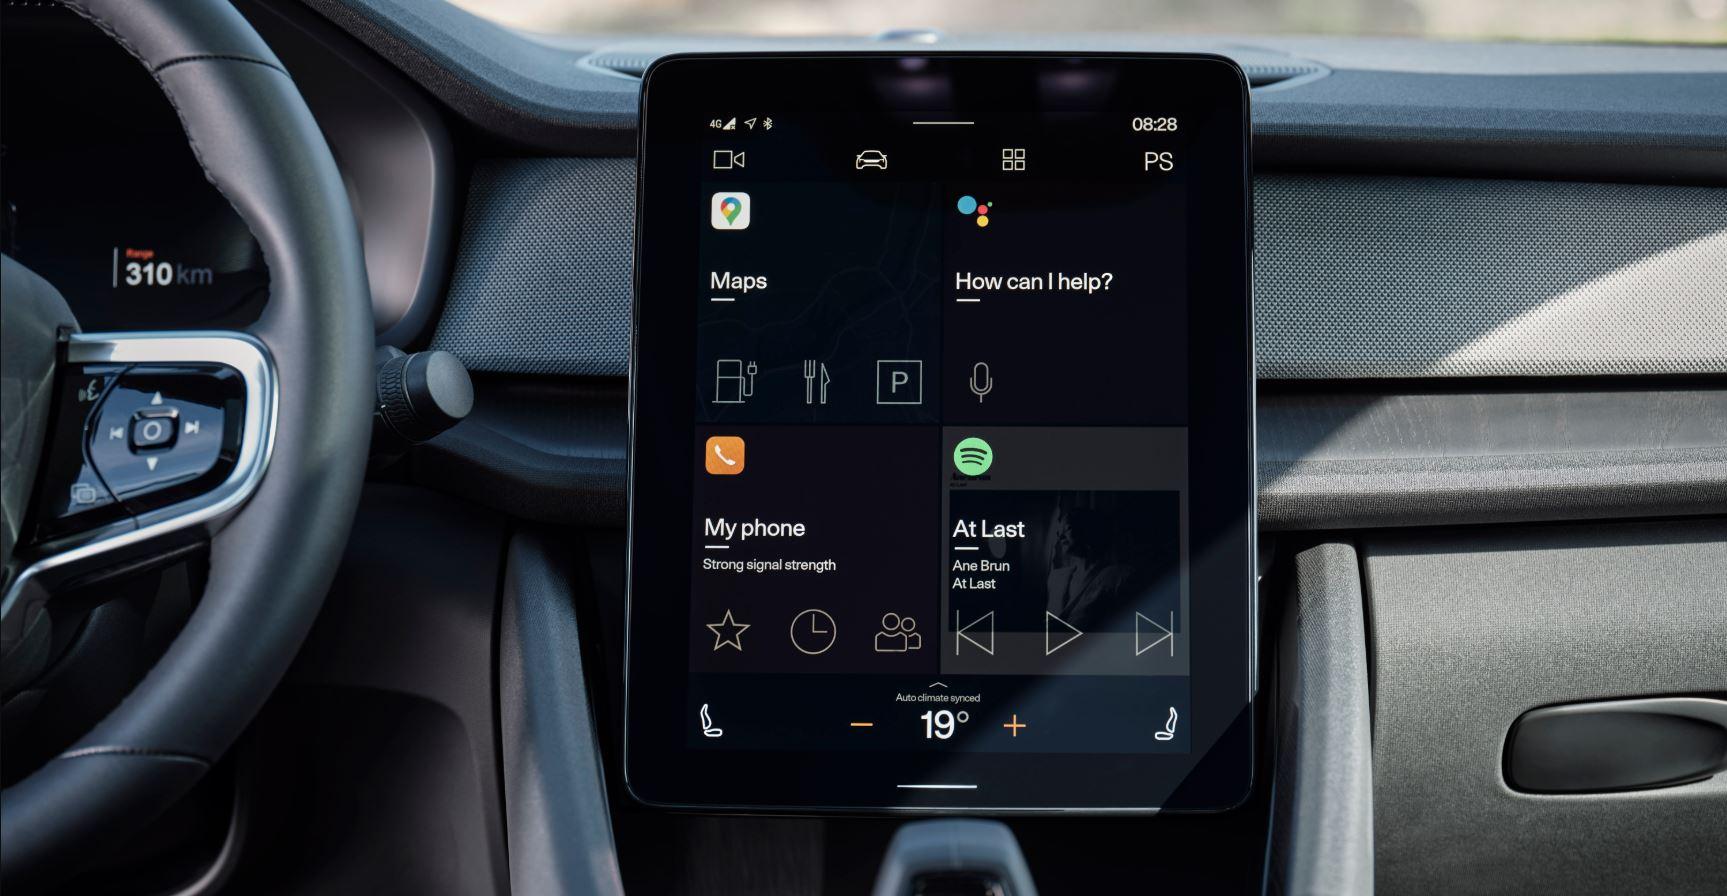 Google-Maps-f-r-Android-Automotive-passt-sich-modernen-E-Autos-an-Update-mit-3-Neuerungen